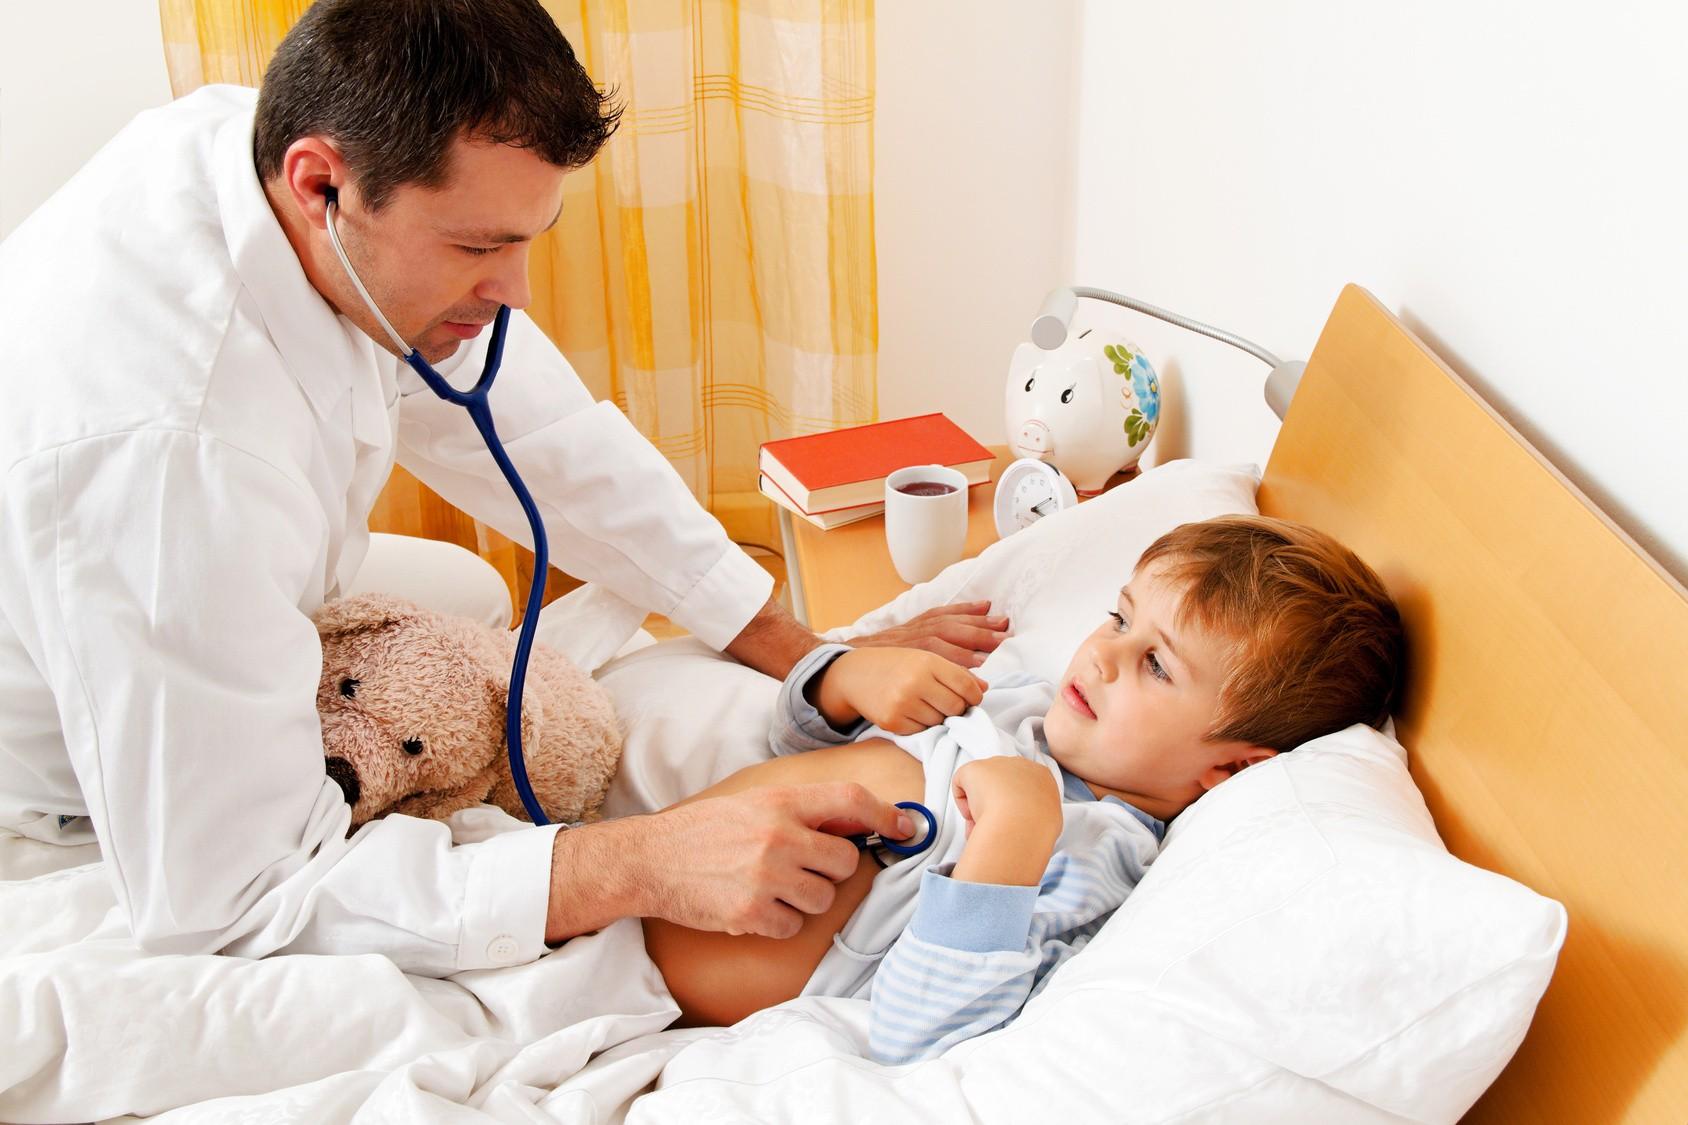 Пневмония народная медицина 20 фотография